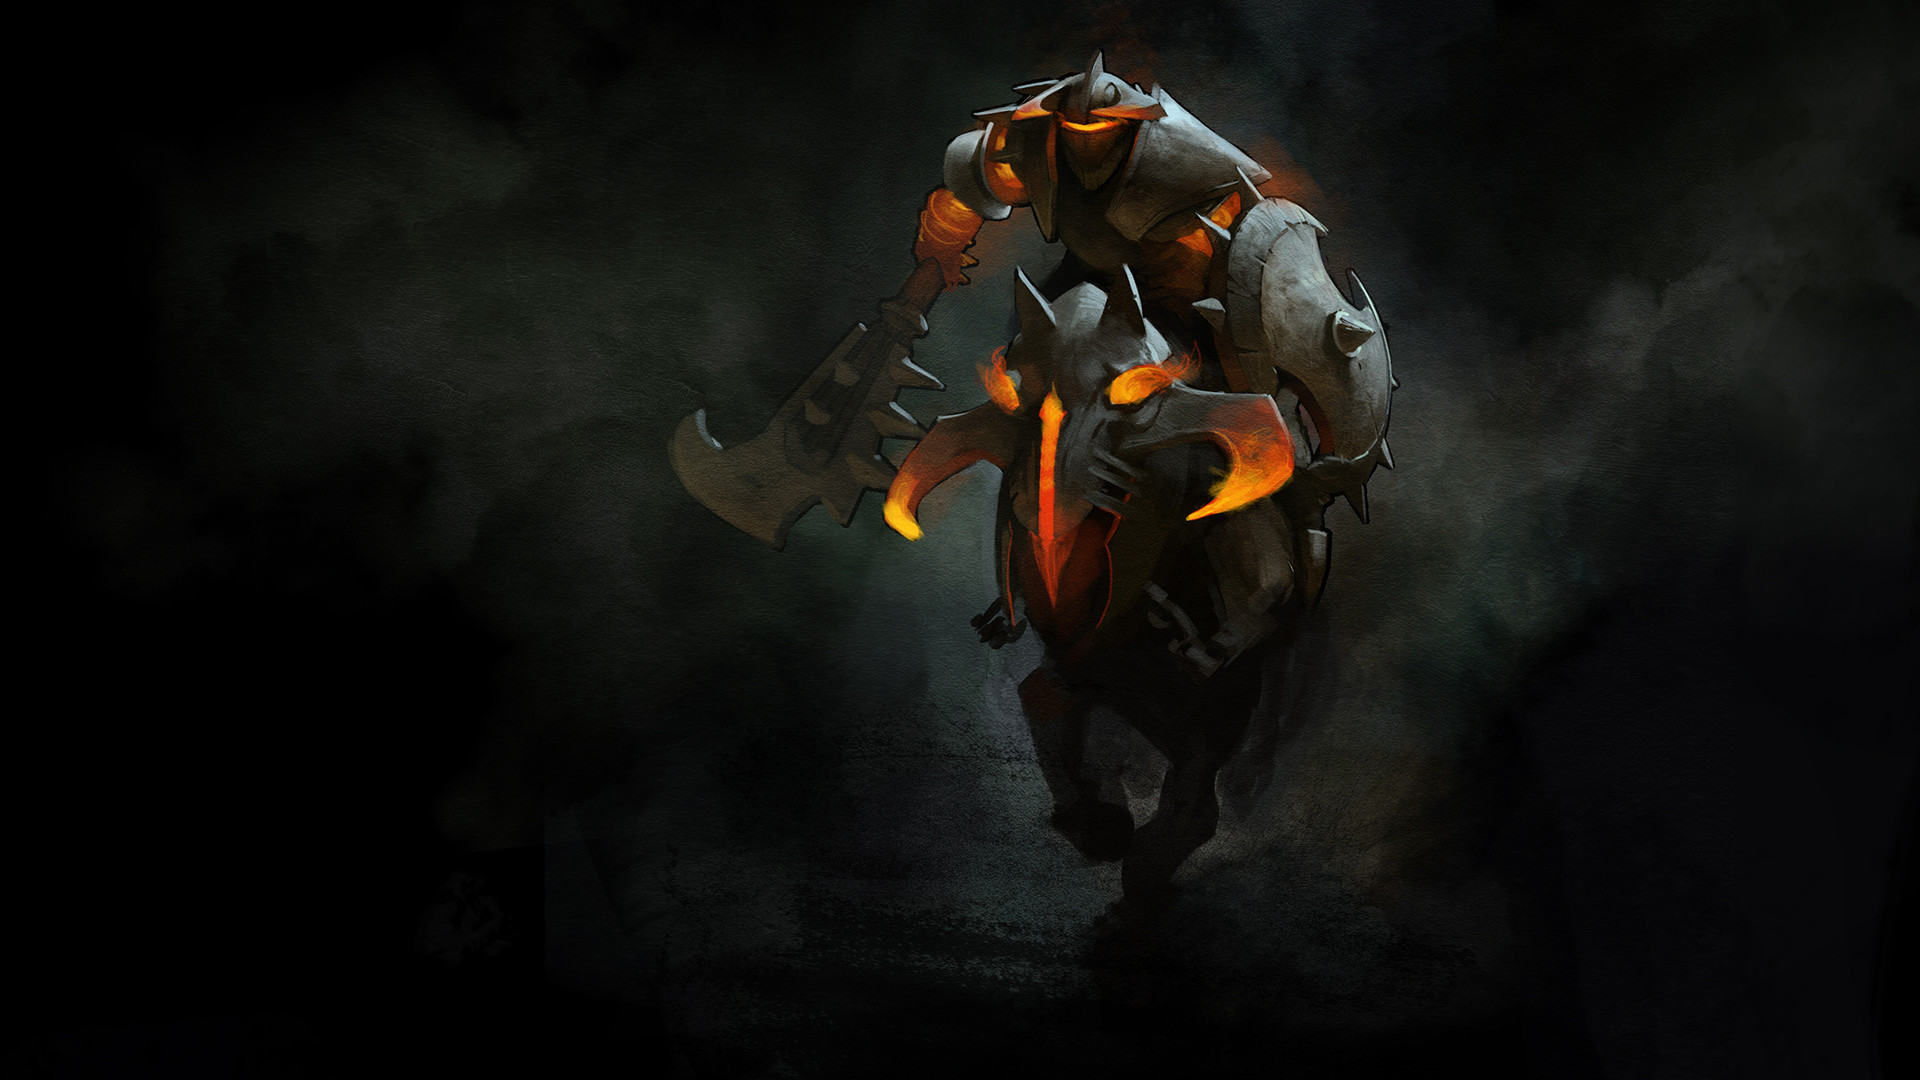 Chaos Knight – DotA 2 HD Wallpaper 1920×1080